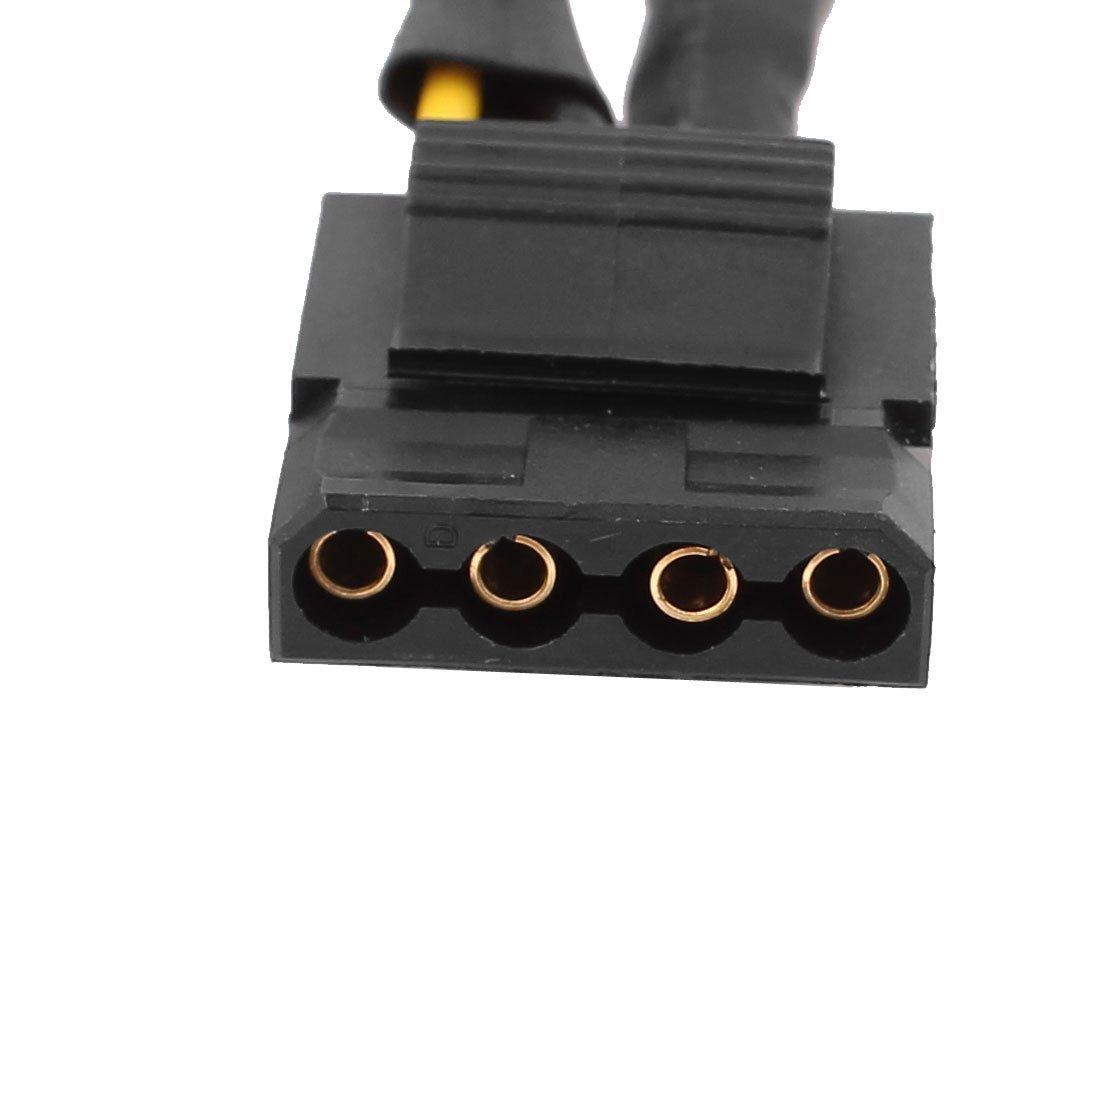 DealMux 35 polegadas 4 Pin Famale Para 3X LP4 Female Power Adapter Preto Cabo by DealMux (Image #2)